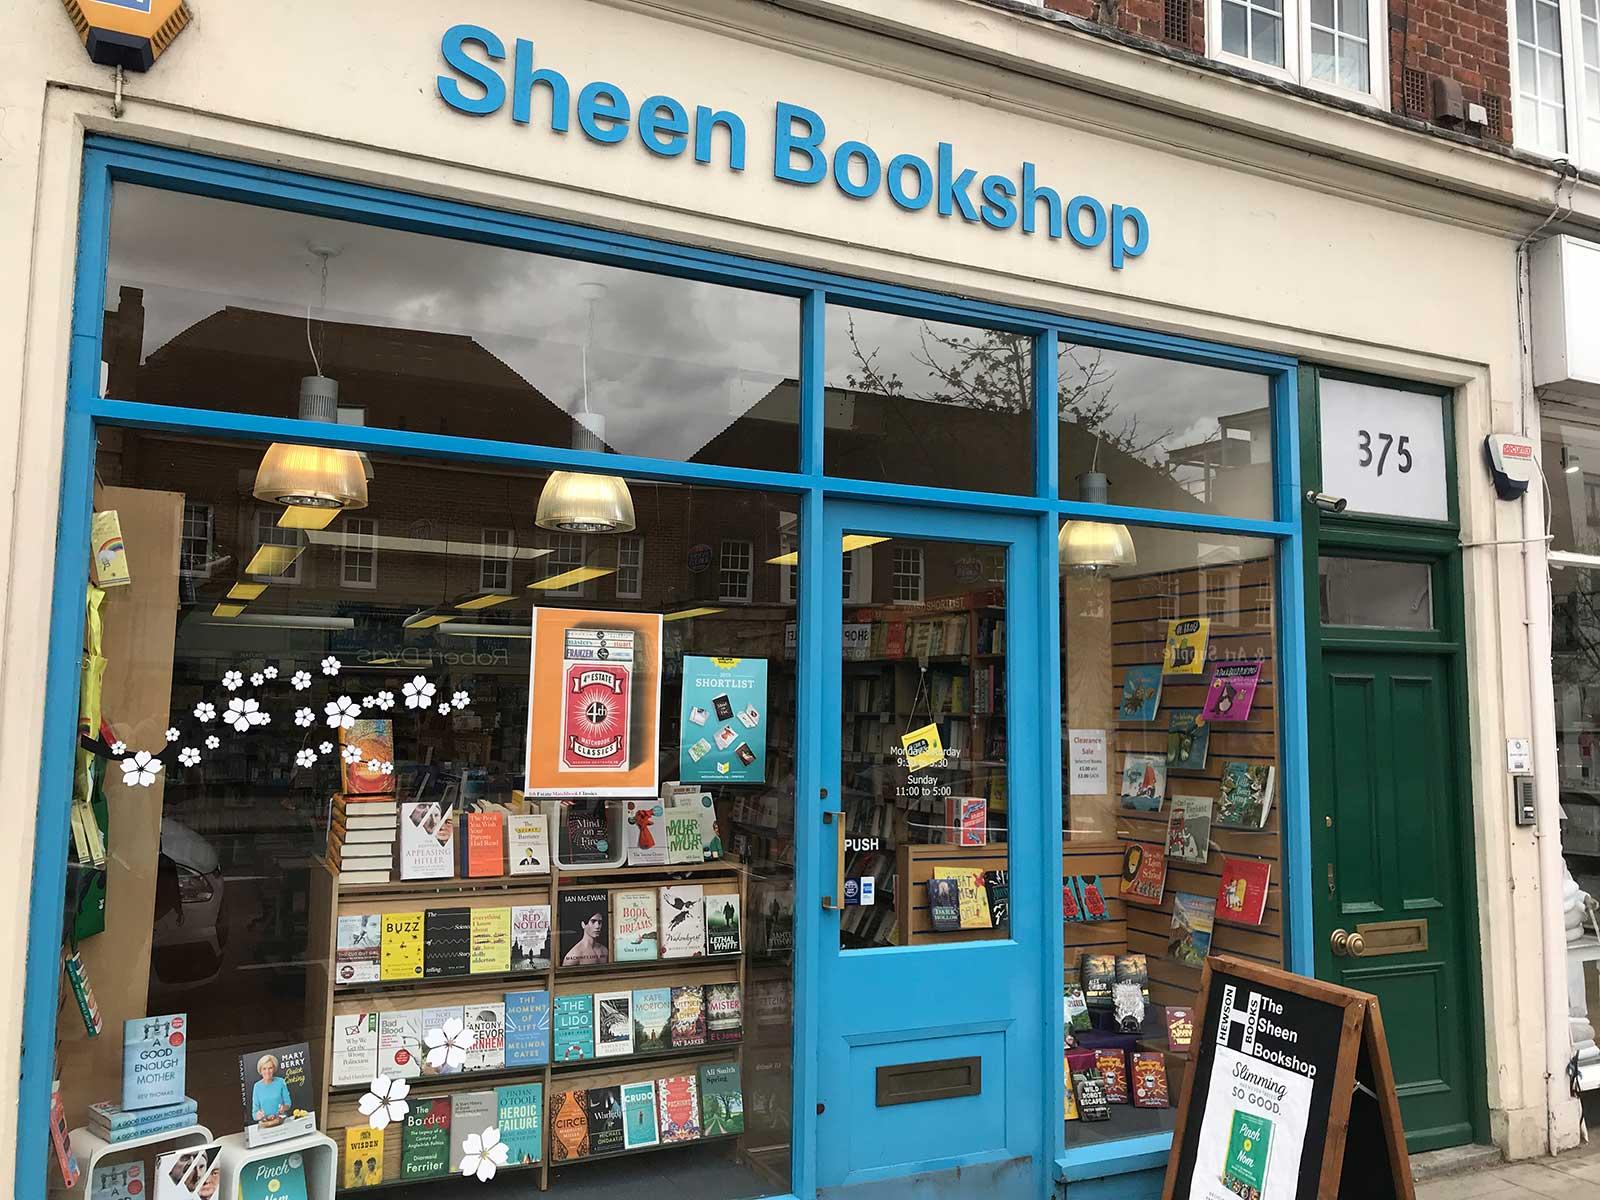 Sheen Bookshop